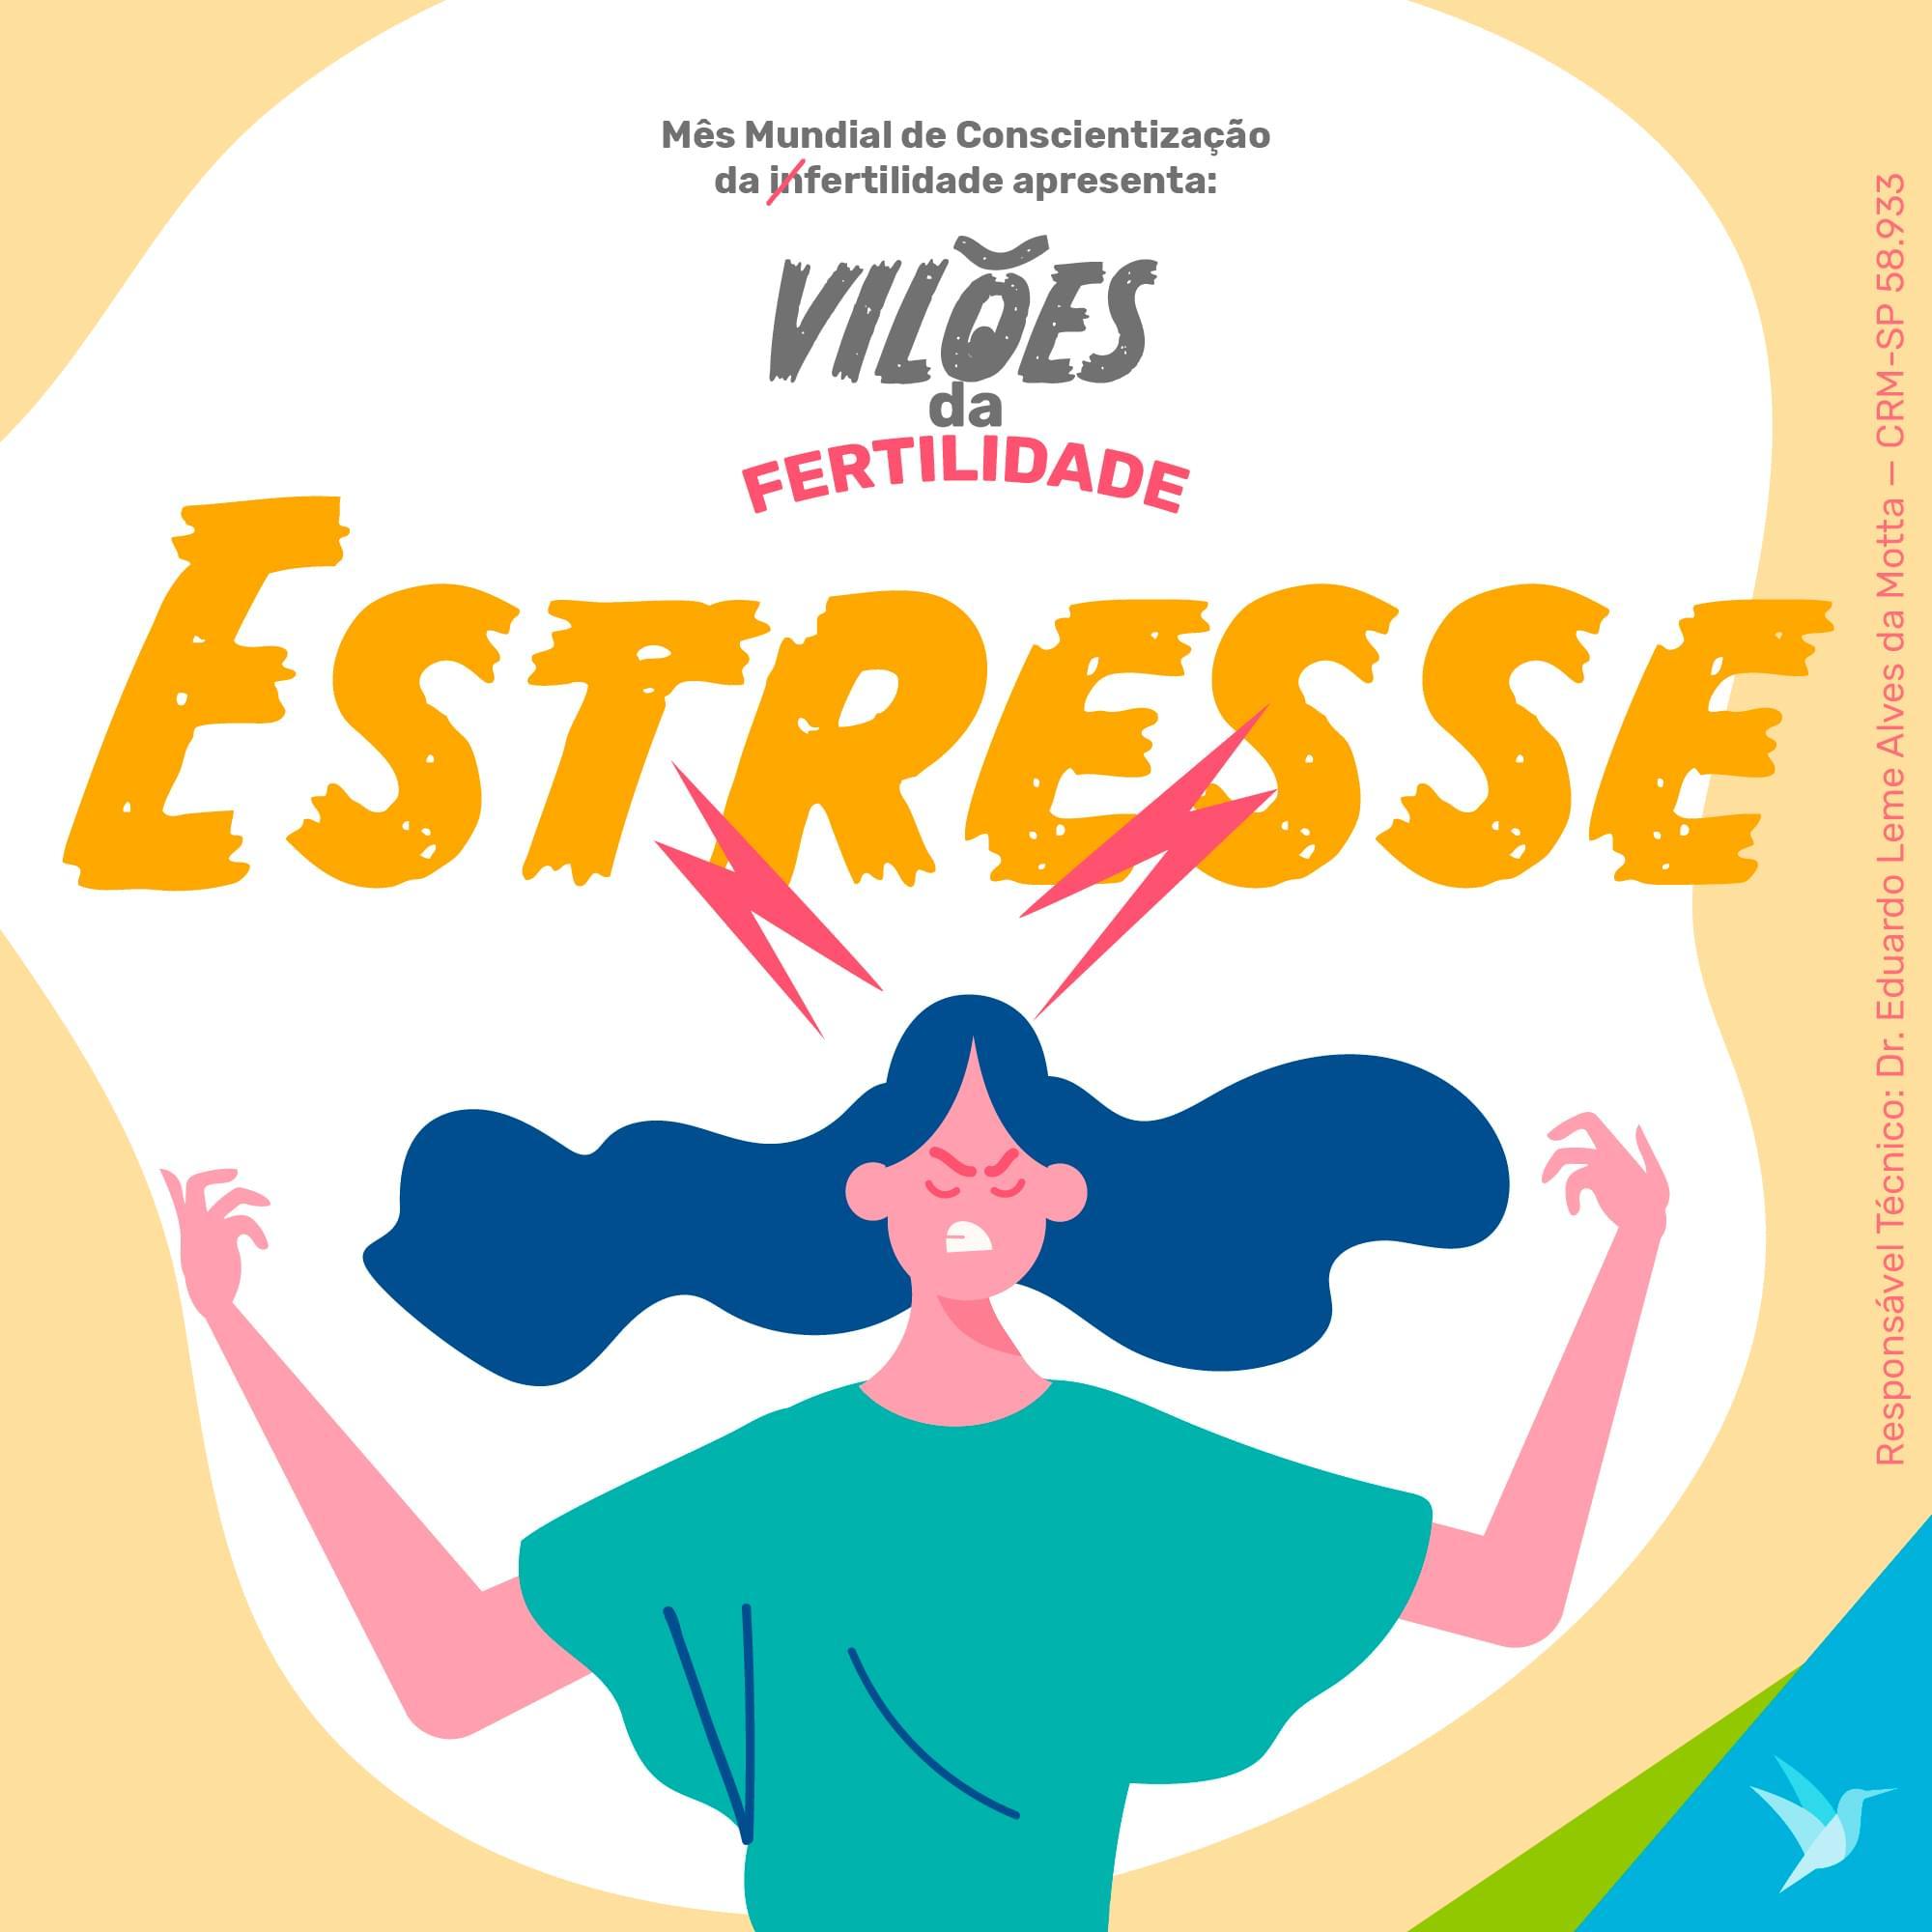 Viloes stress